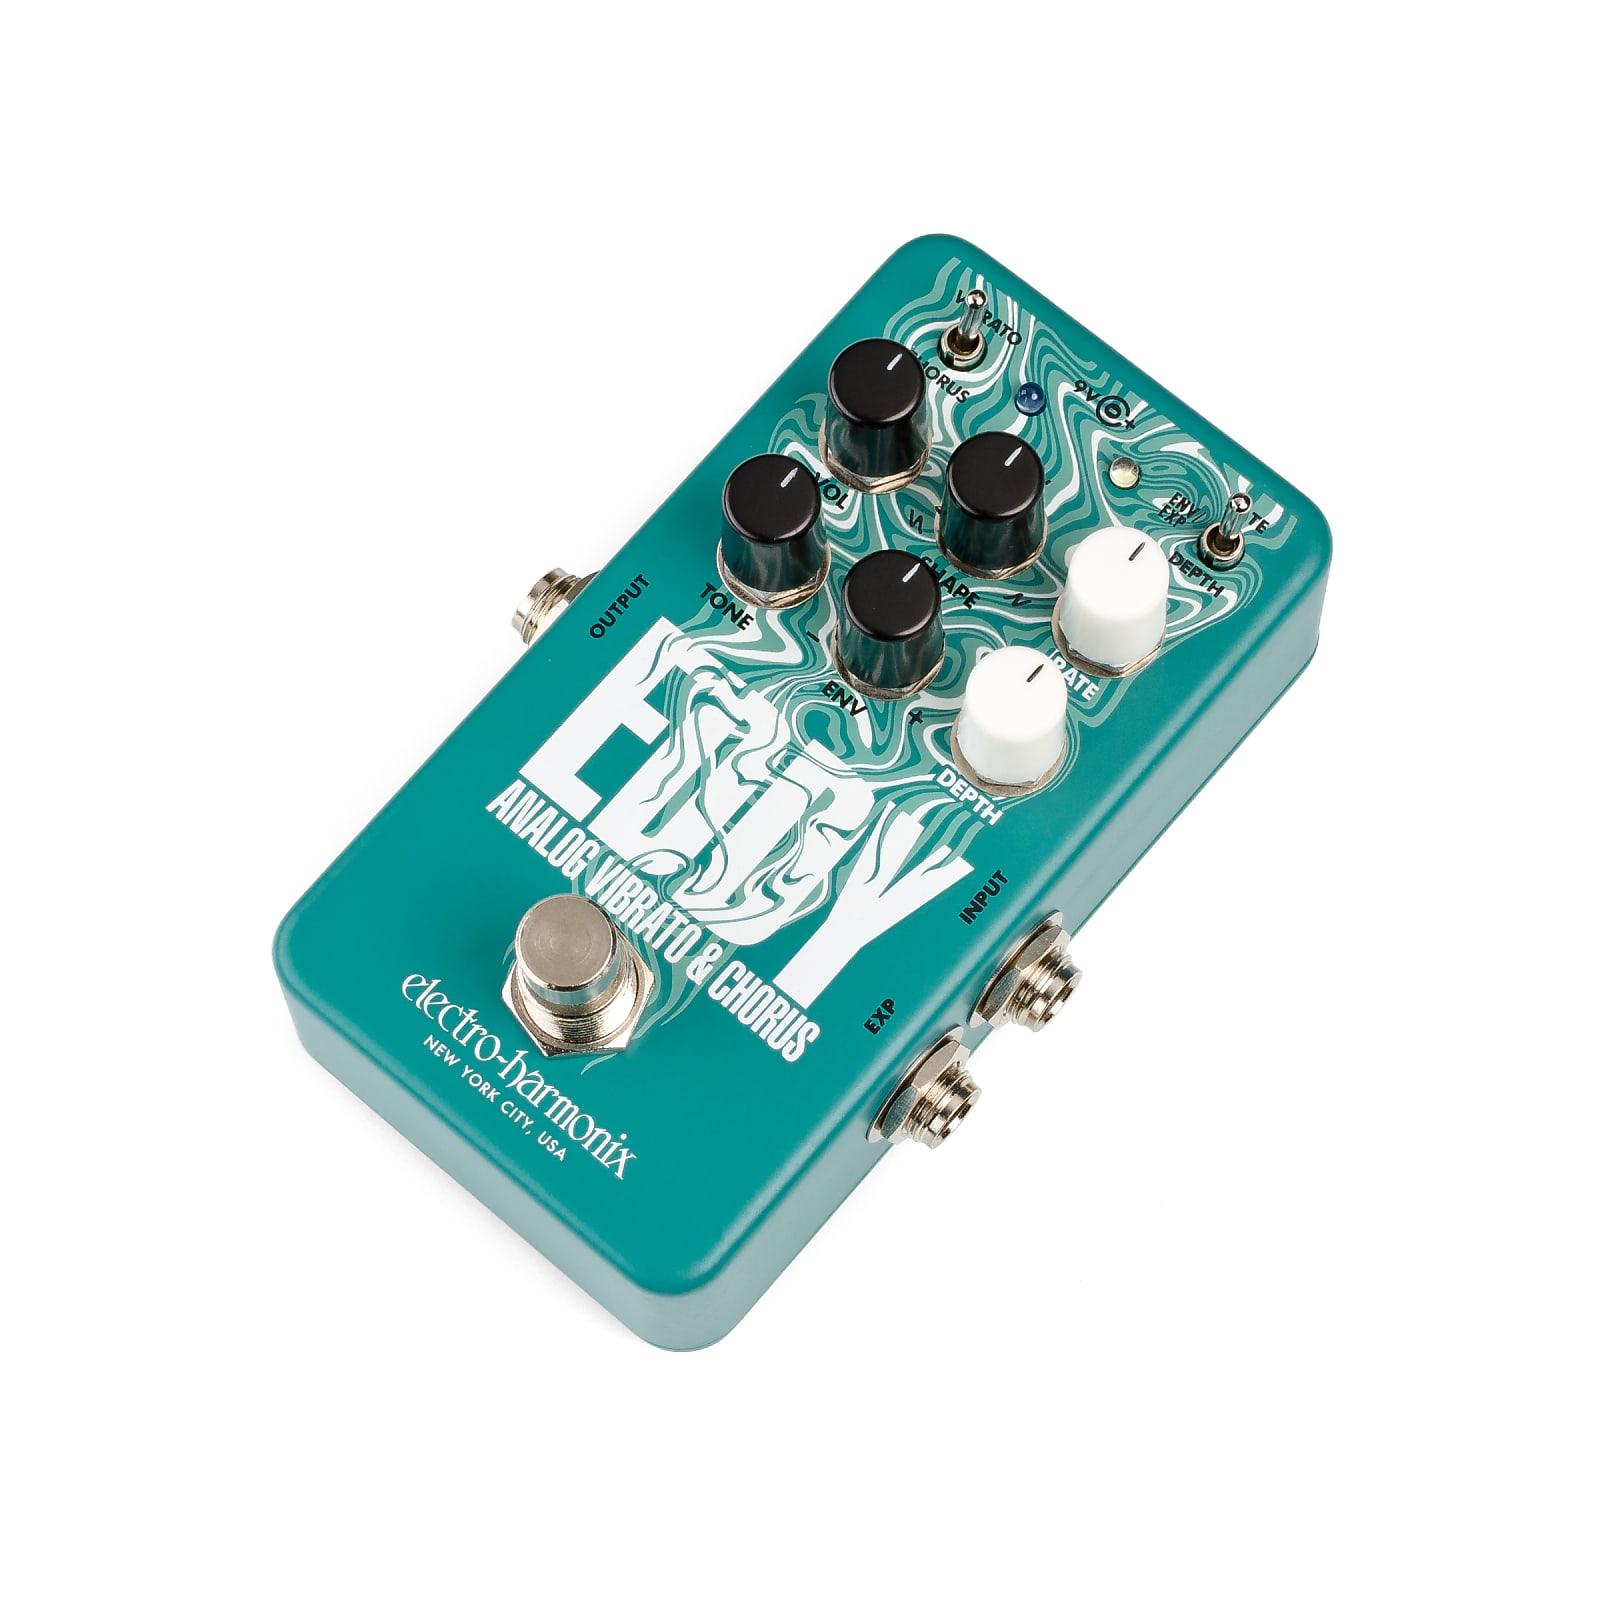 Electro-Harmonix EHX Eddy Analog Vibrato & Chorus Effects Pedal